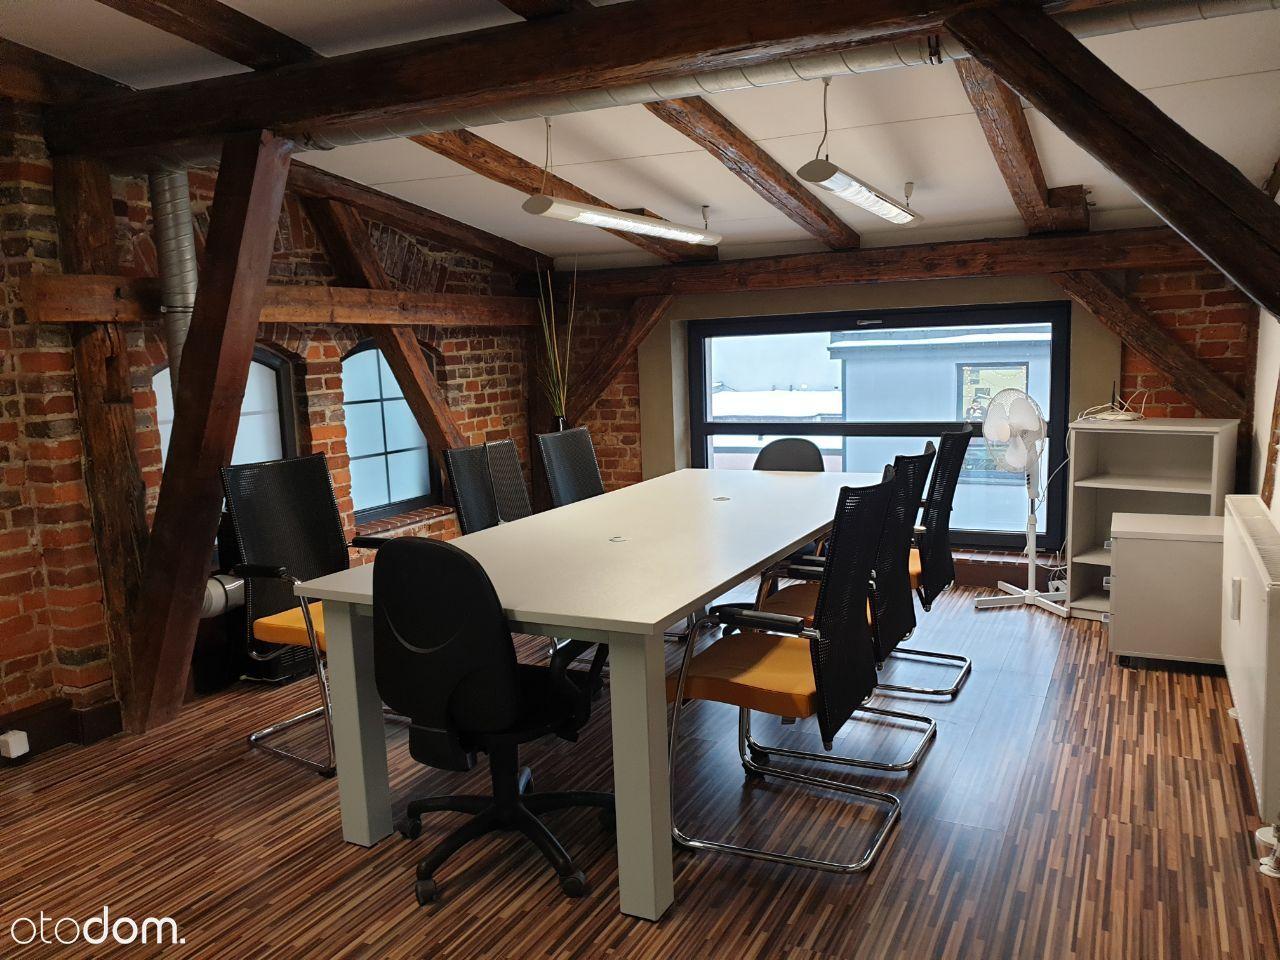 Biuro 25m2 typu loft w centrum - Gliwce Młyńska 4